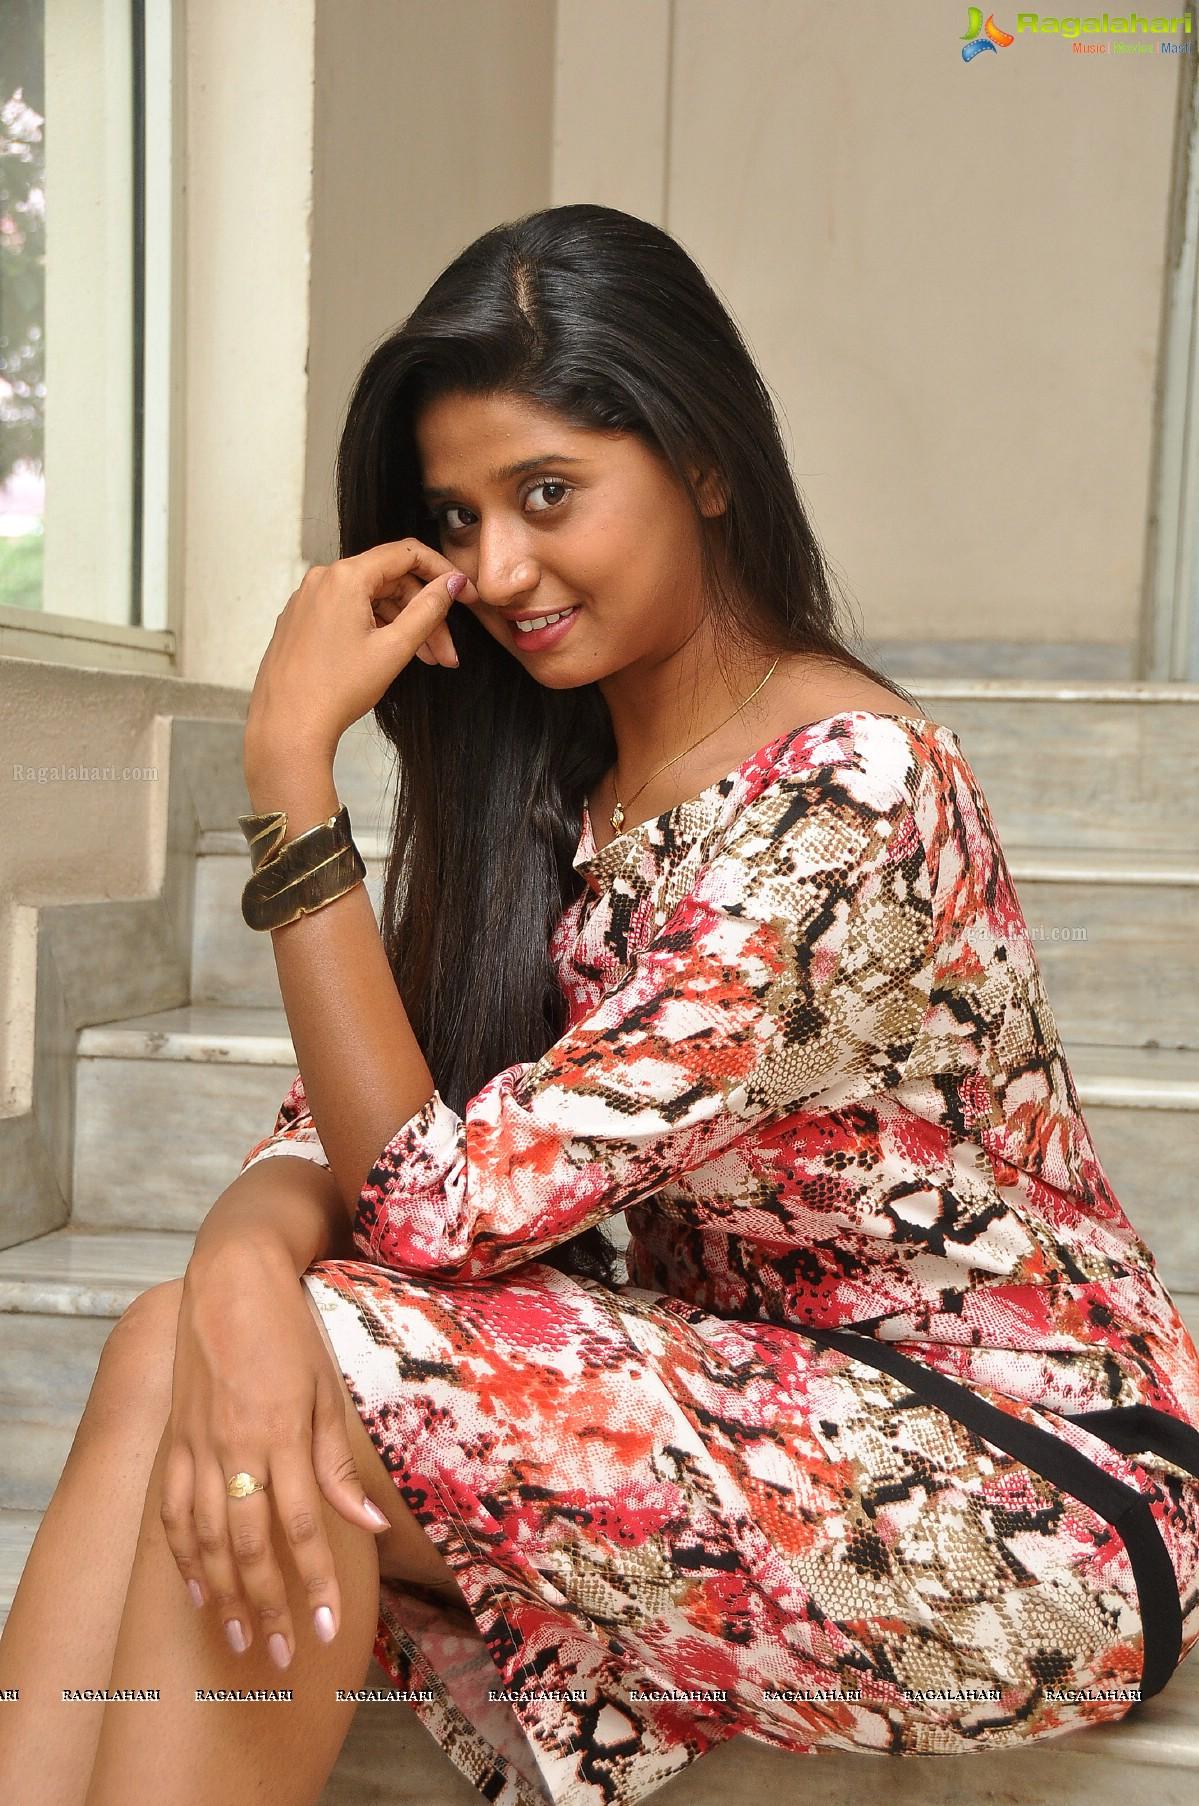 shalini vadlamani image 2 | telugu heroines wallpapers ,images